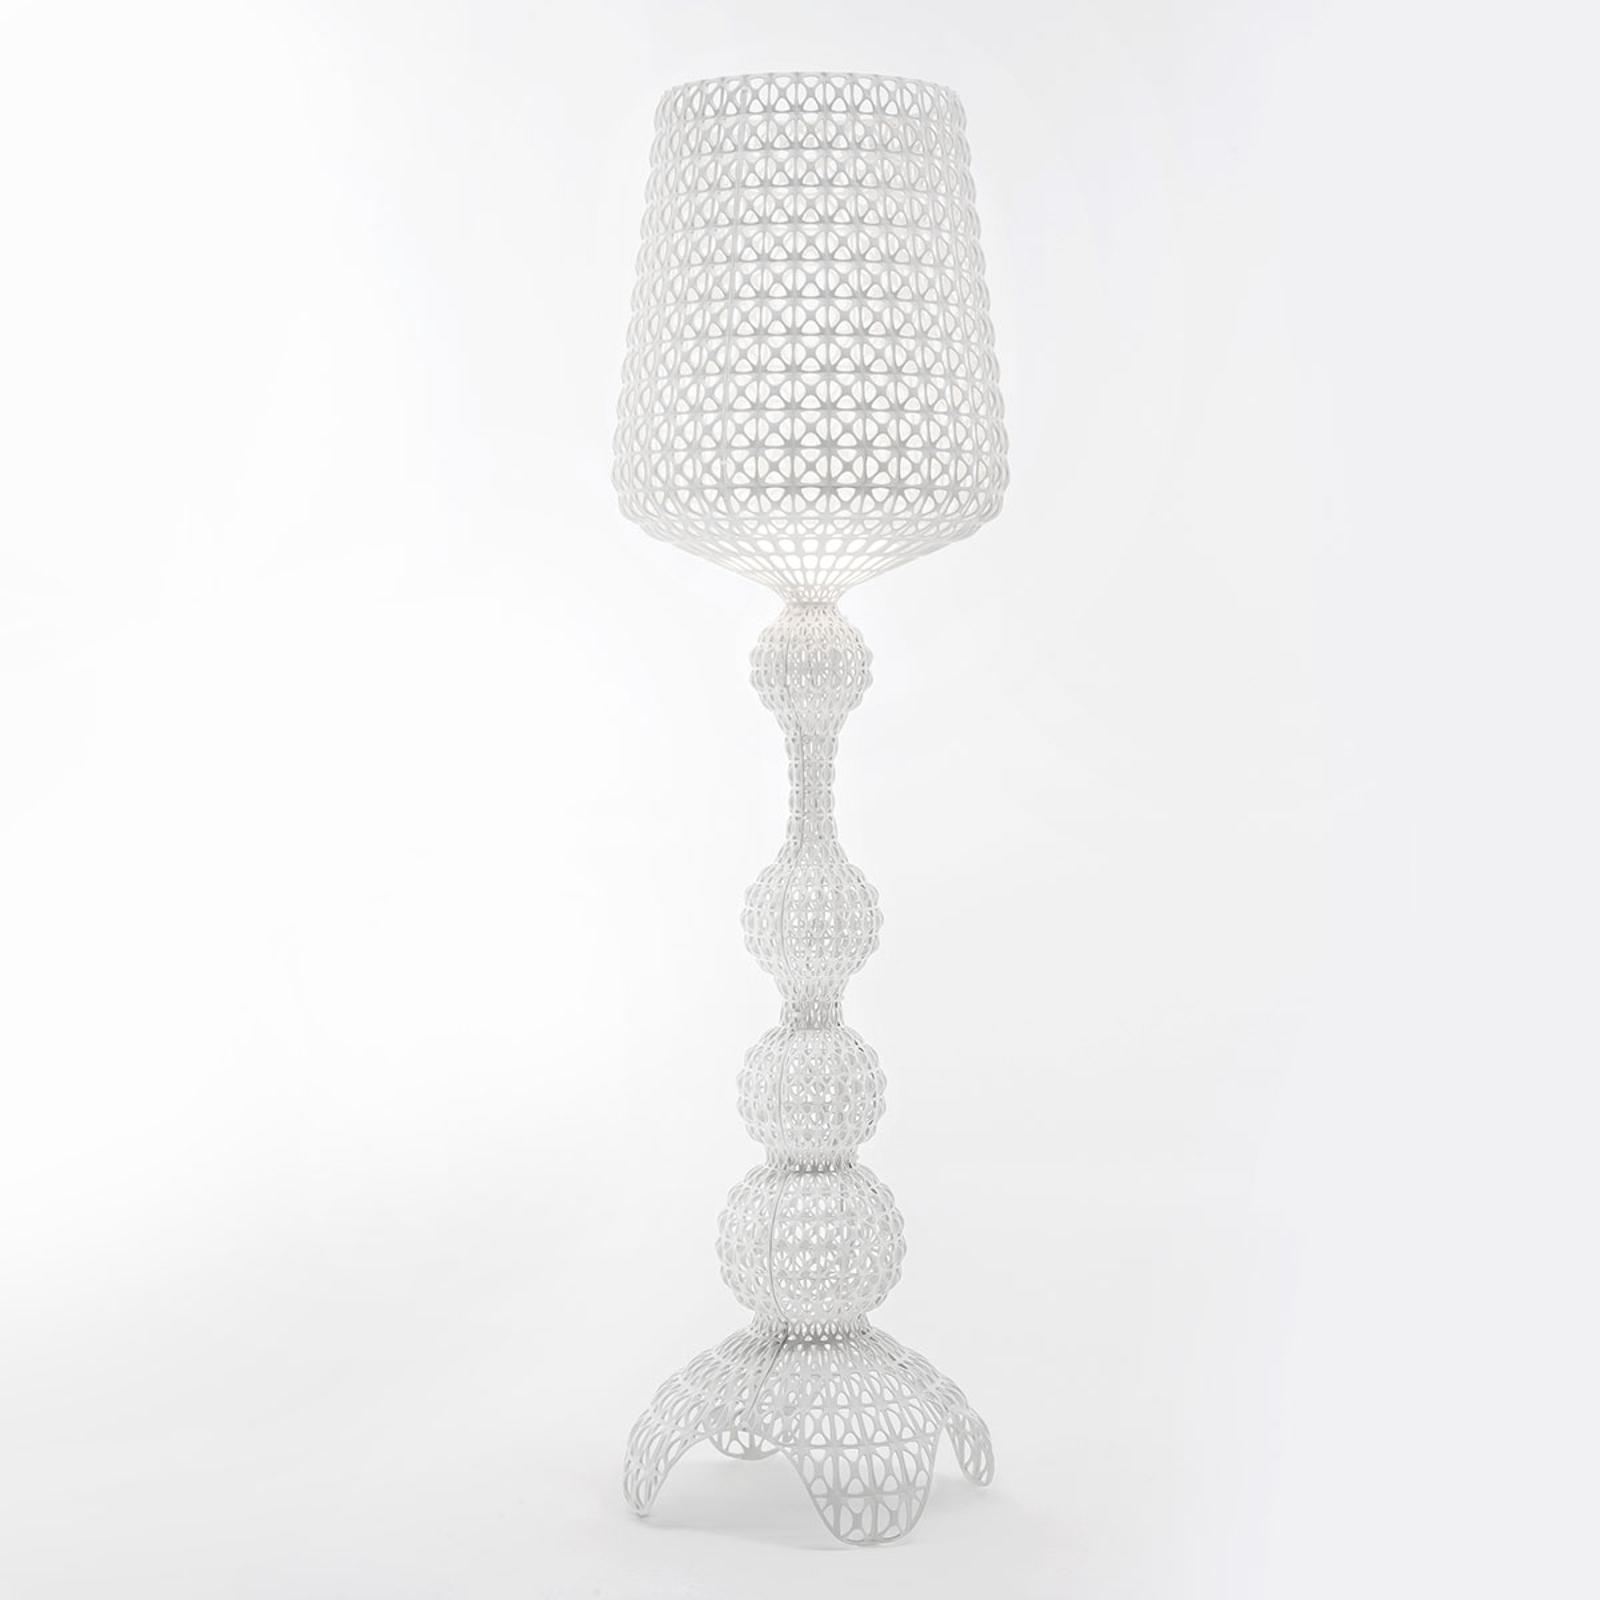 Designerska lampa stojąca LED Kabuki, biała